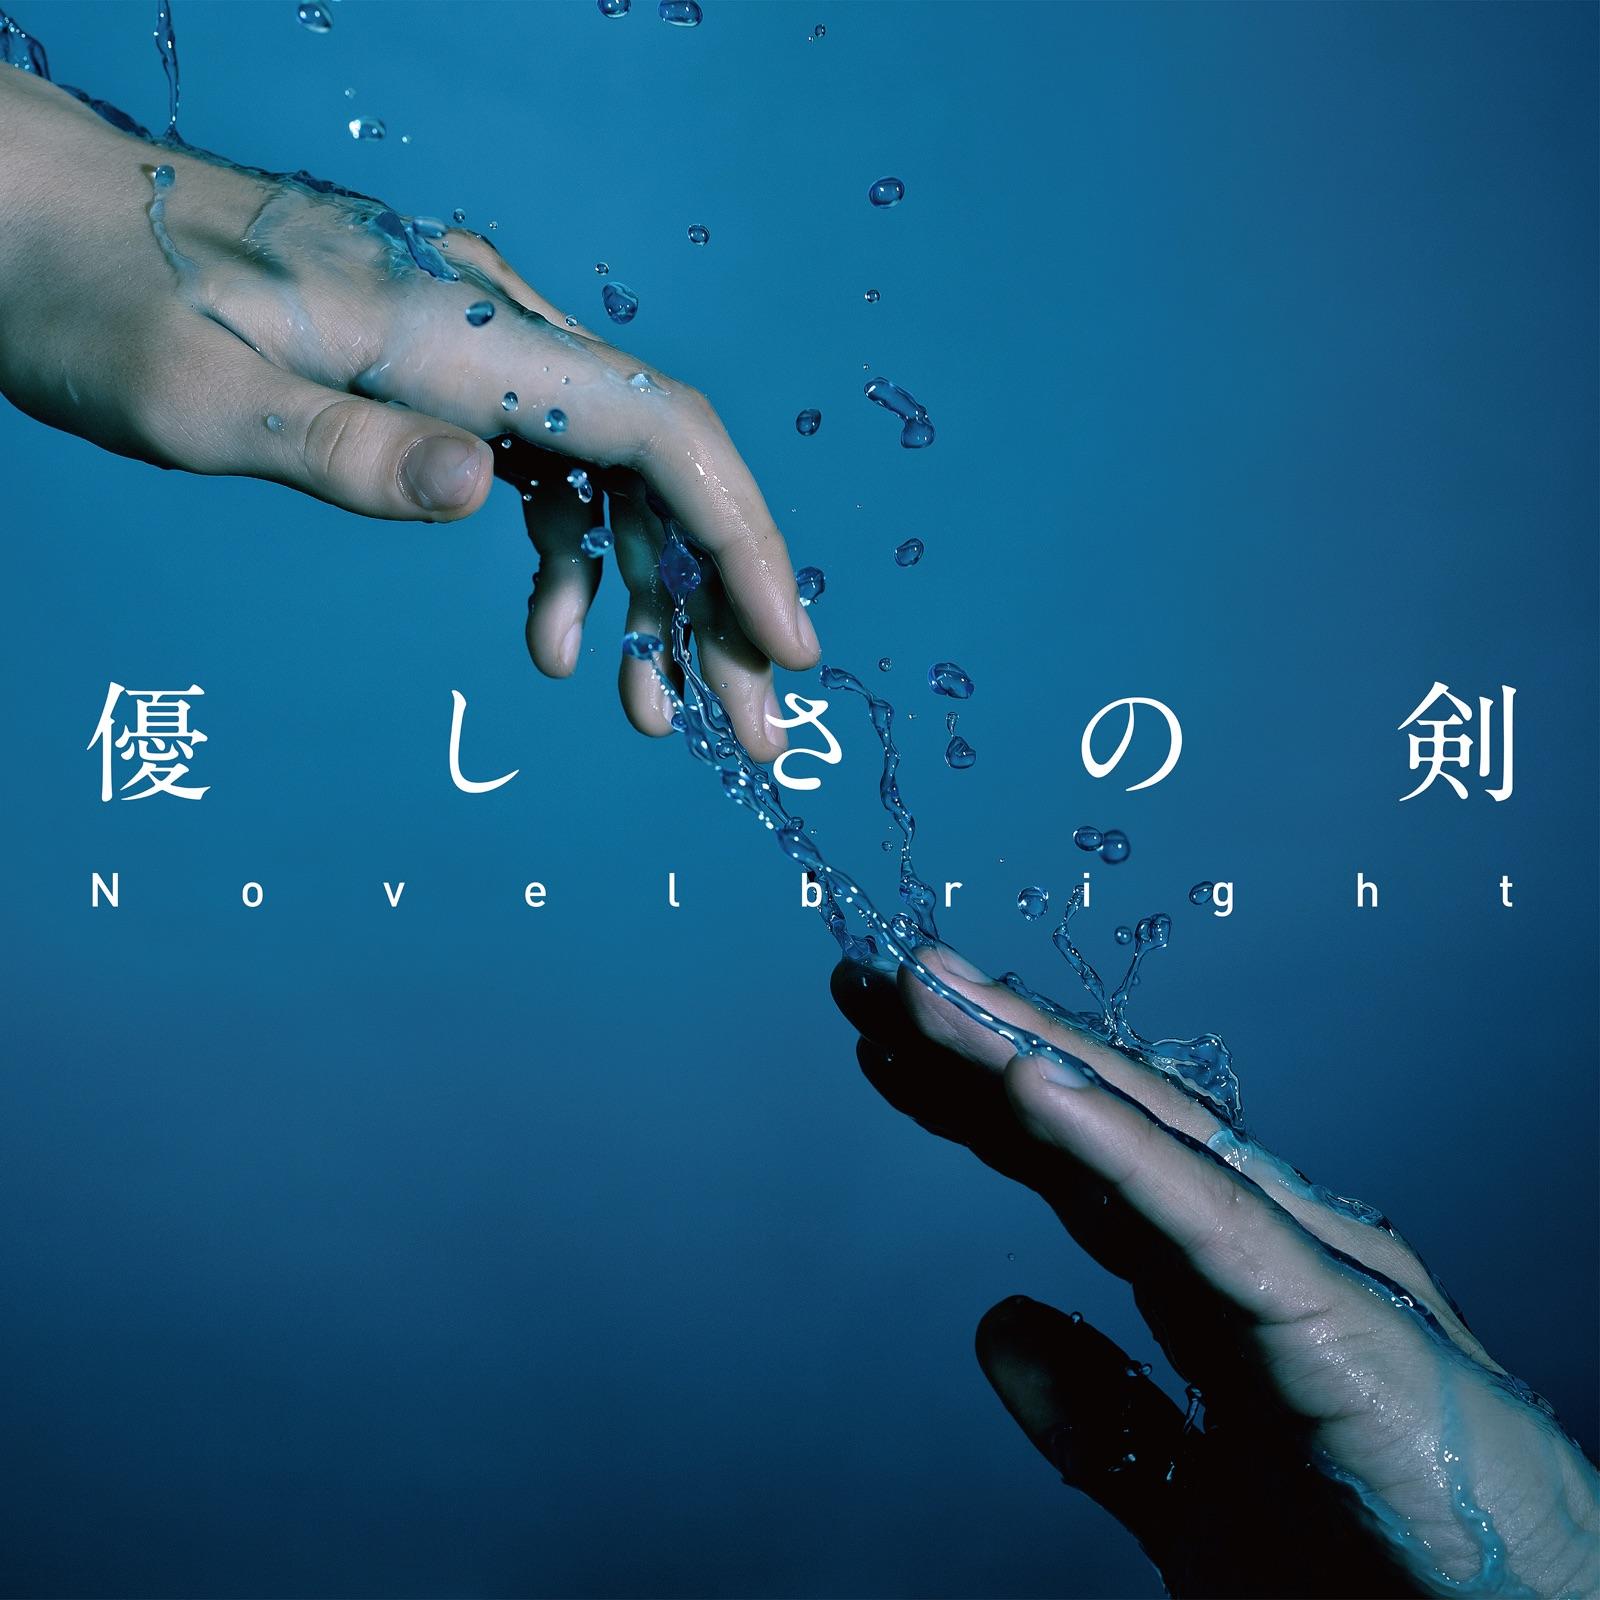 Download [Single] Novelbright – Sword of Kindness Novelbright – 優しさの剣 [Mp3320KbpsRar] [ 2021.09.03] zip flac aac Mp3